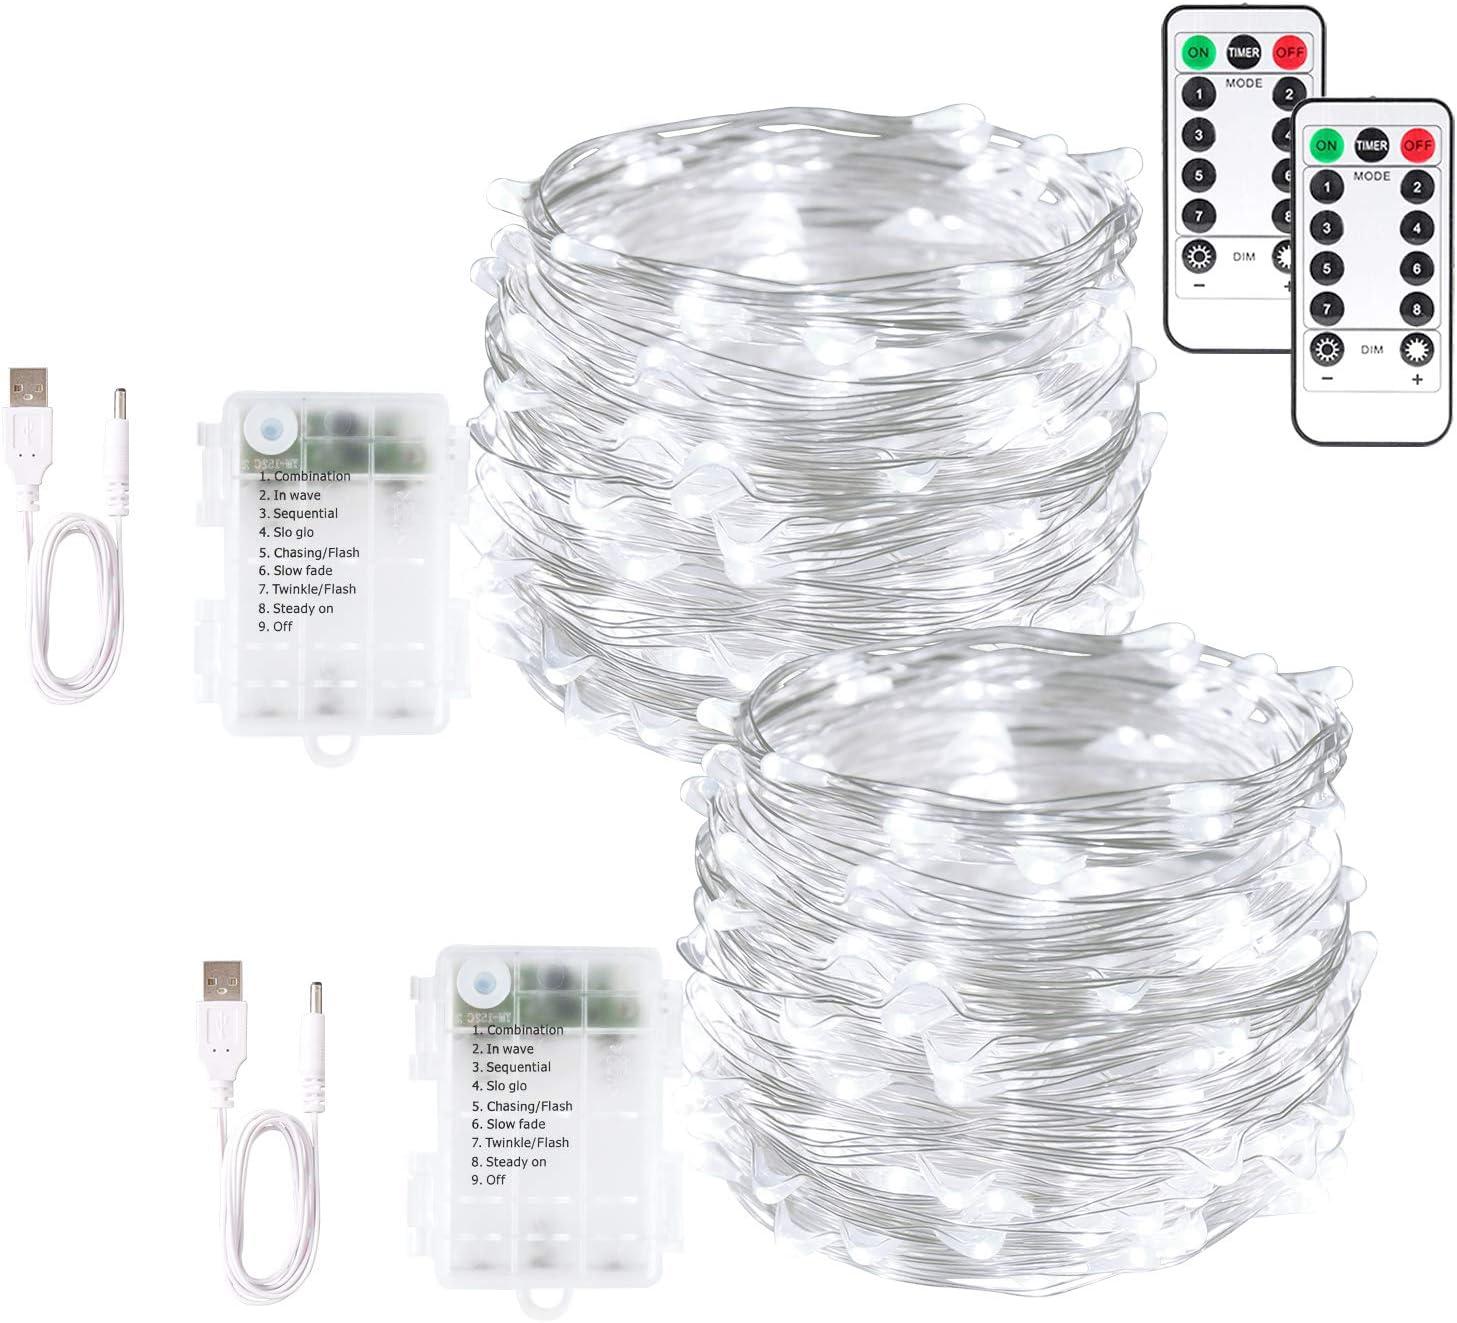 Blingstar Fairy Lights 2 Austin Mall Pack String USB 100 and Ranking TOP9 33ft LED